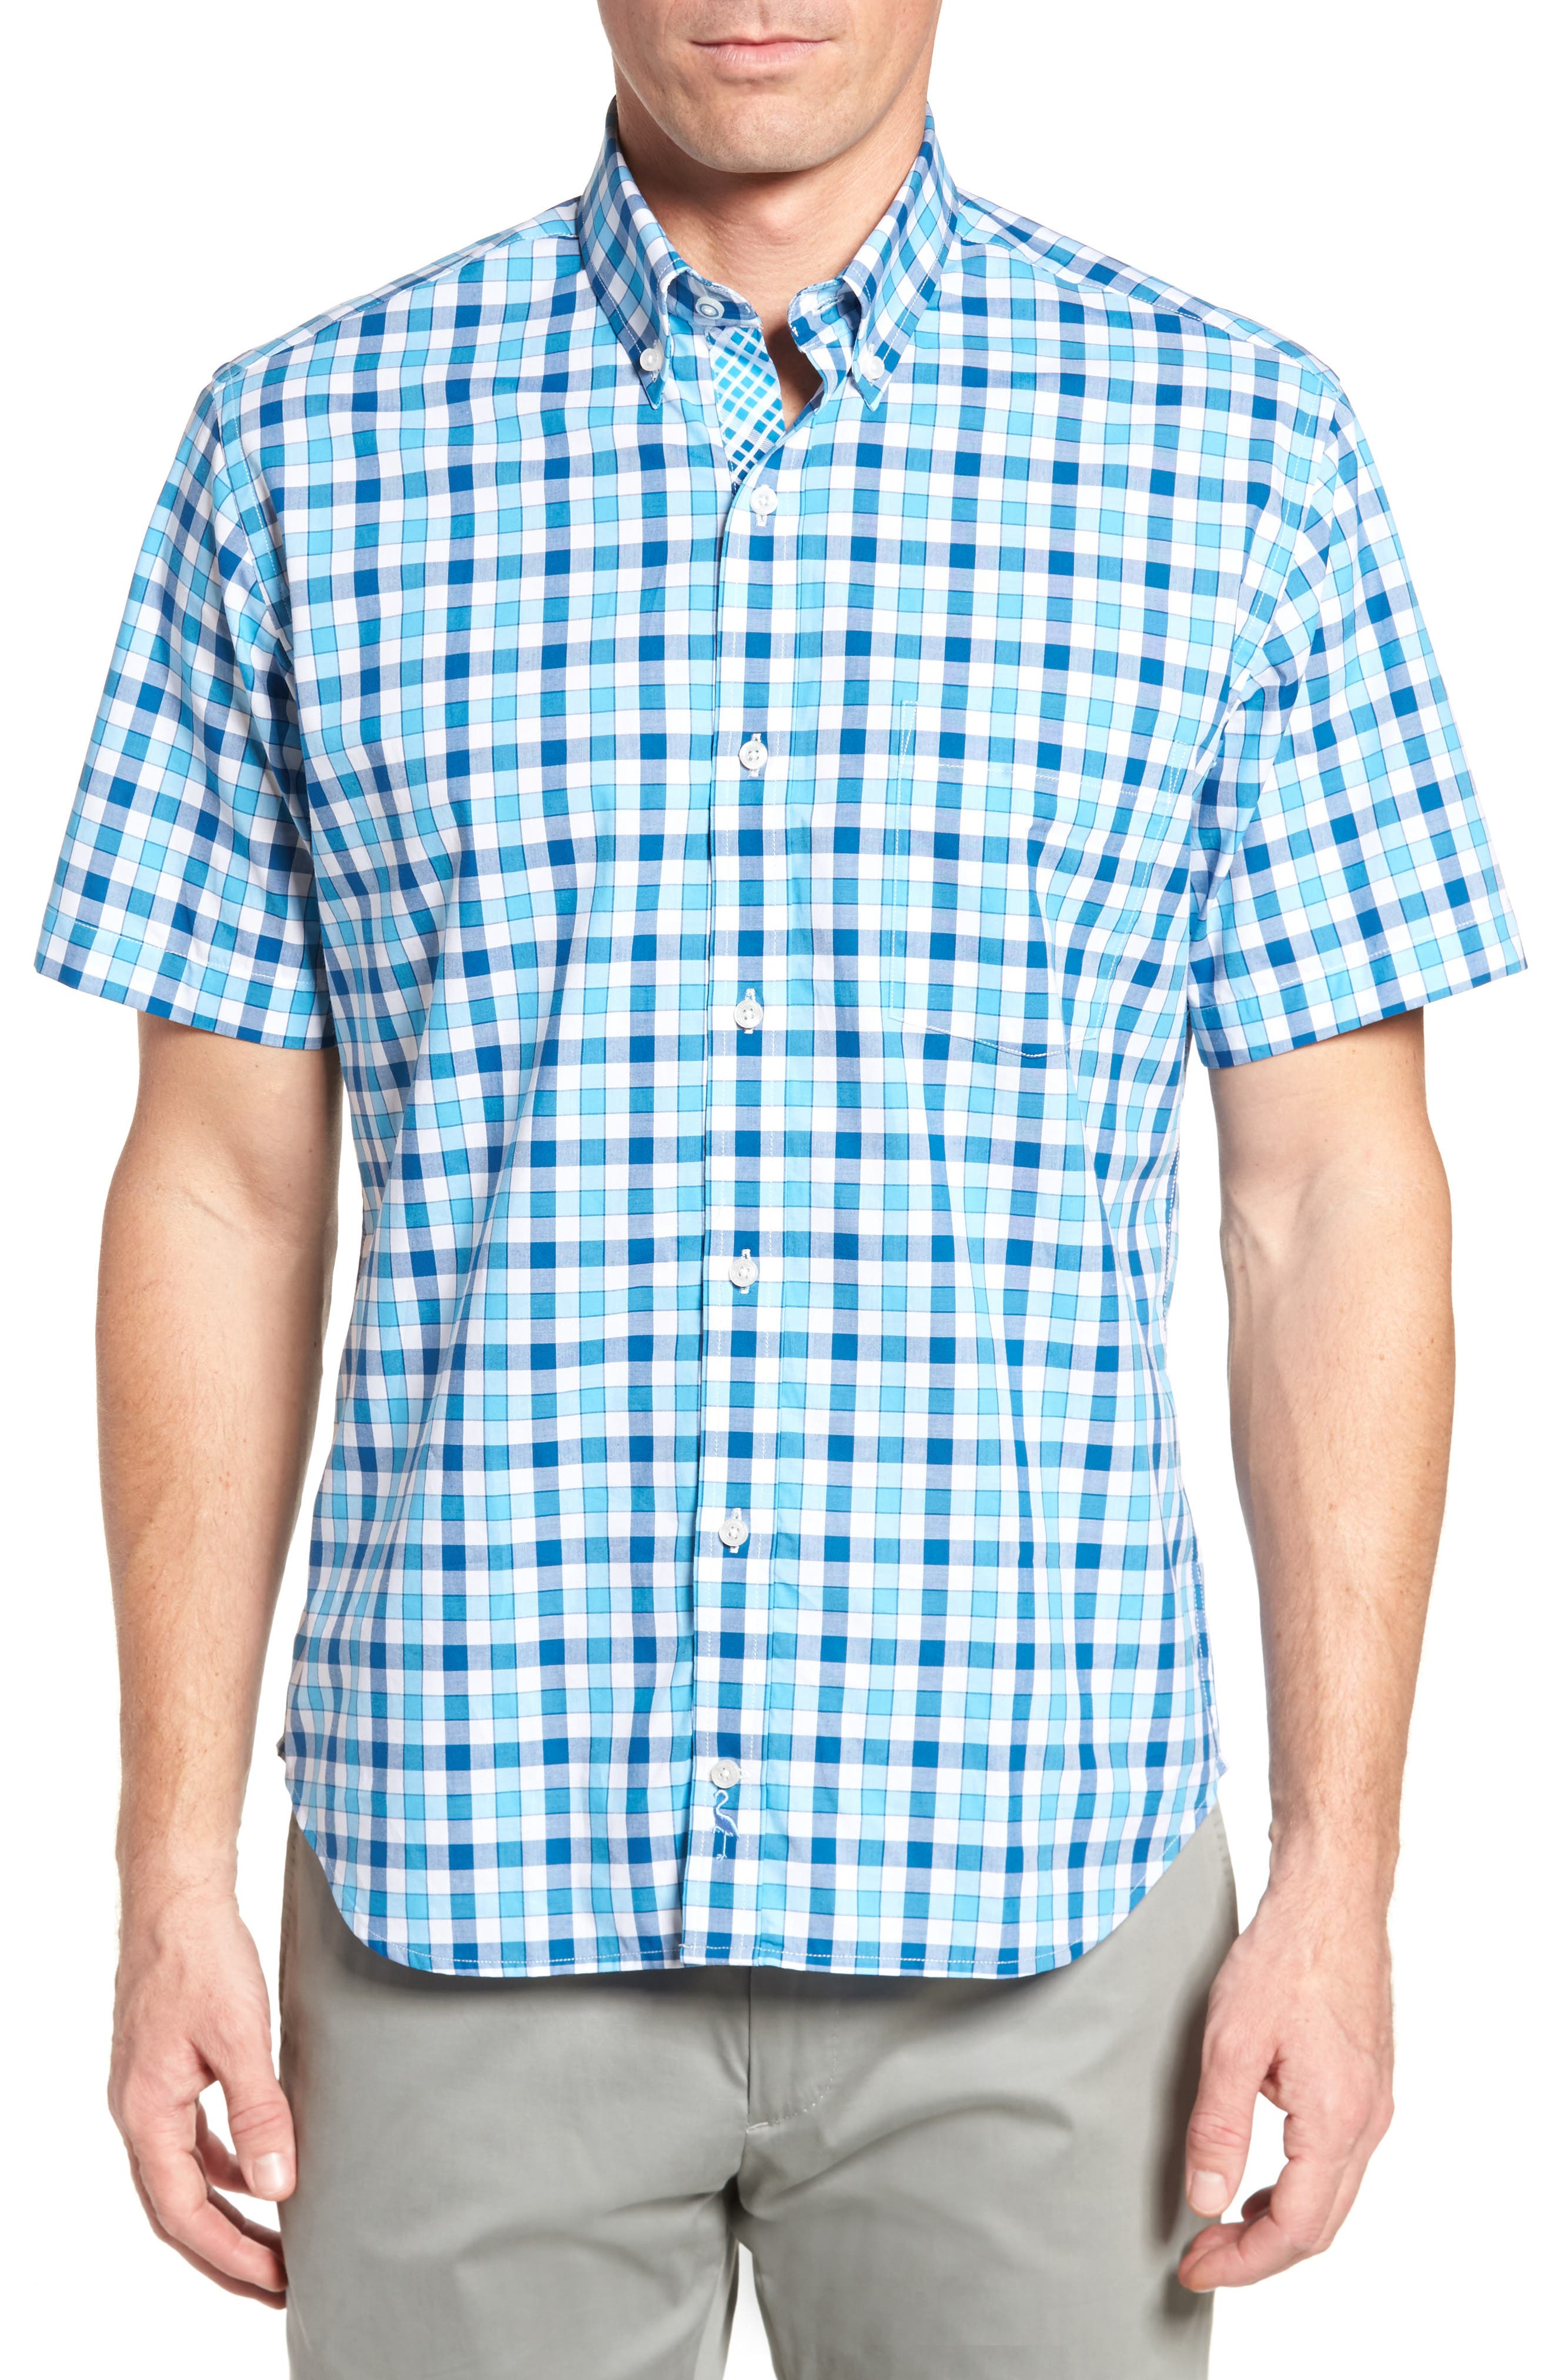 West We Go Regular Fit Plaid Sport Shirt,                         Main,                         color, Aqua